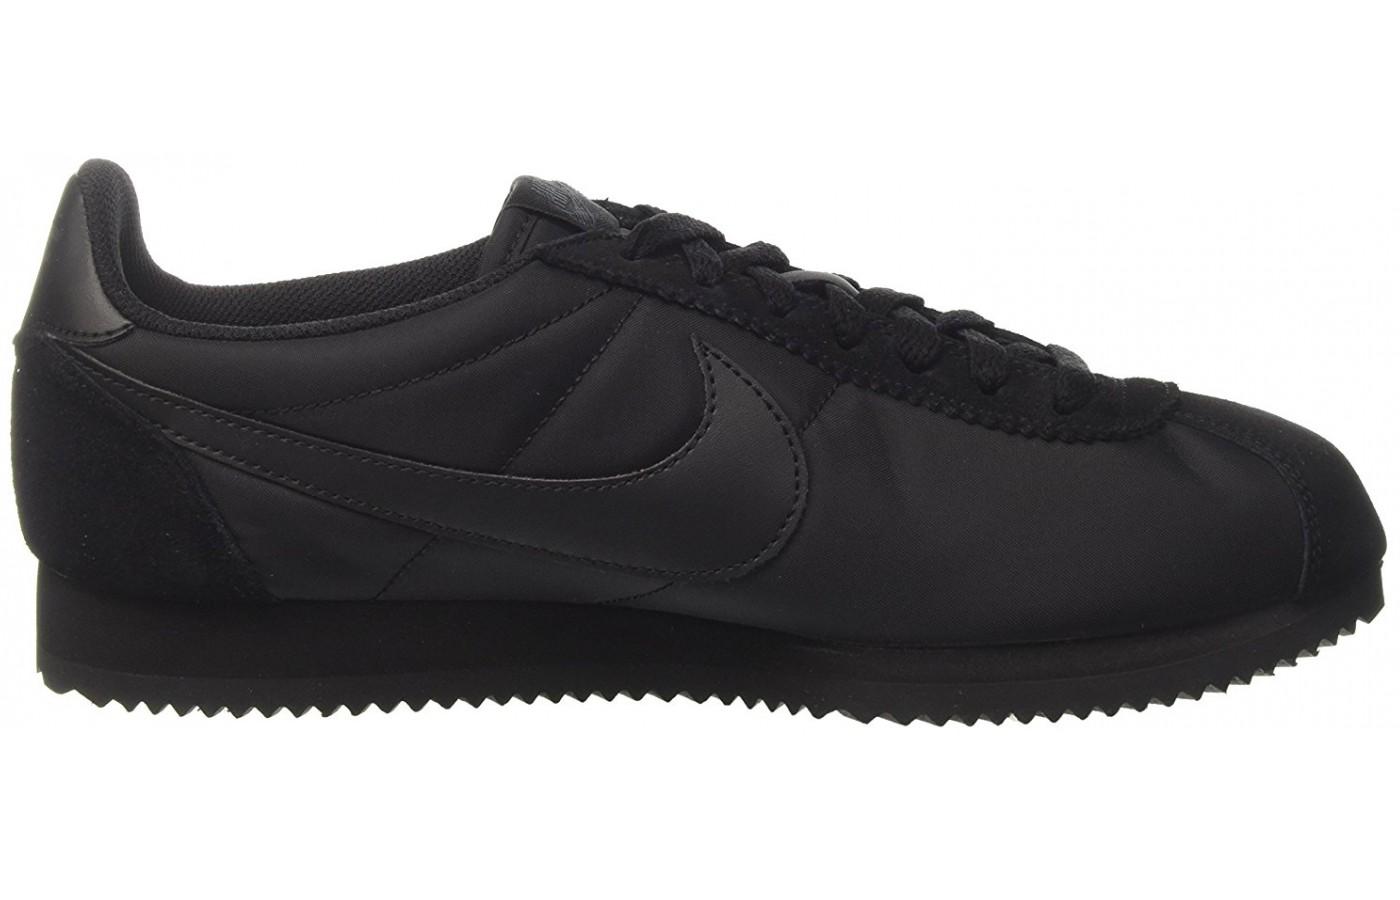 new concept 68ef0 82737 nike cortez shoes